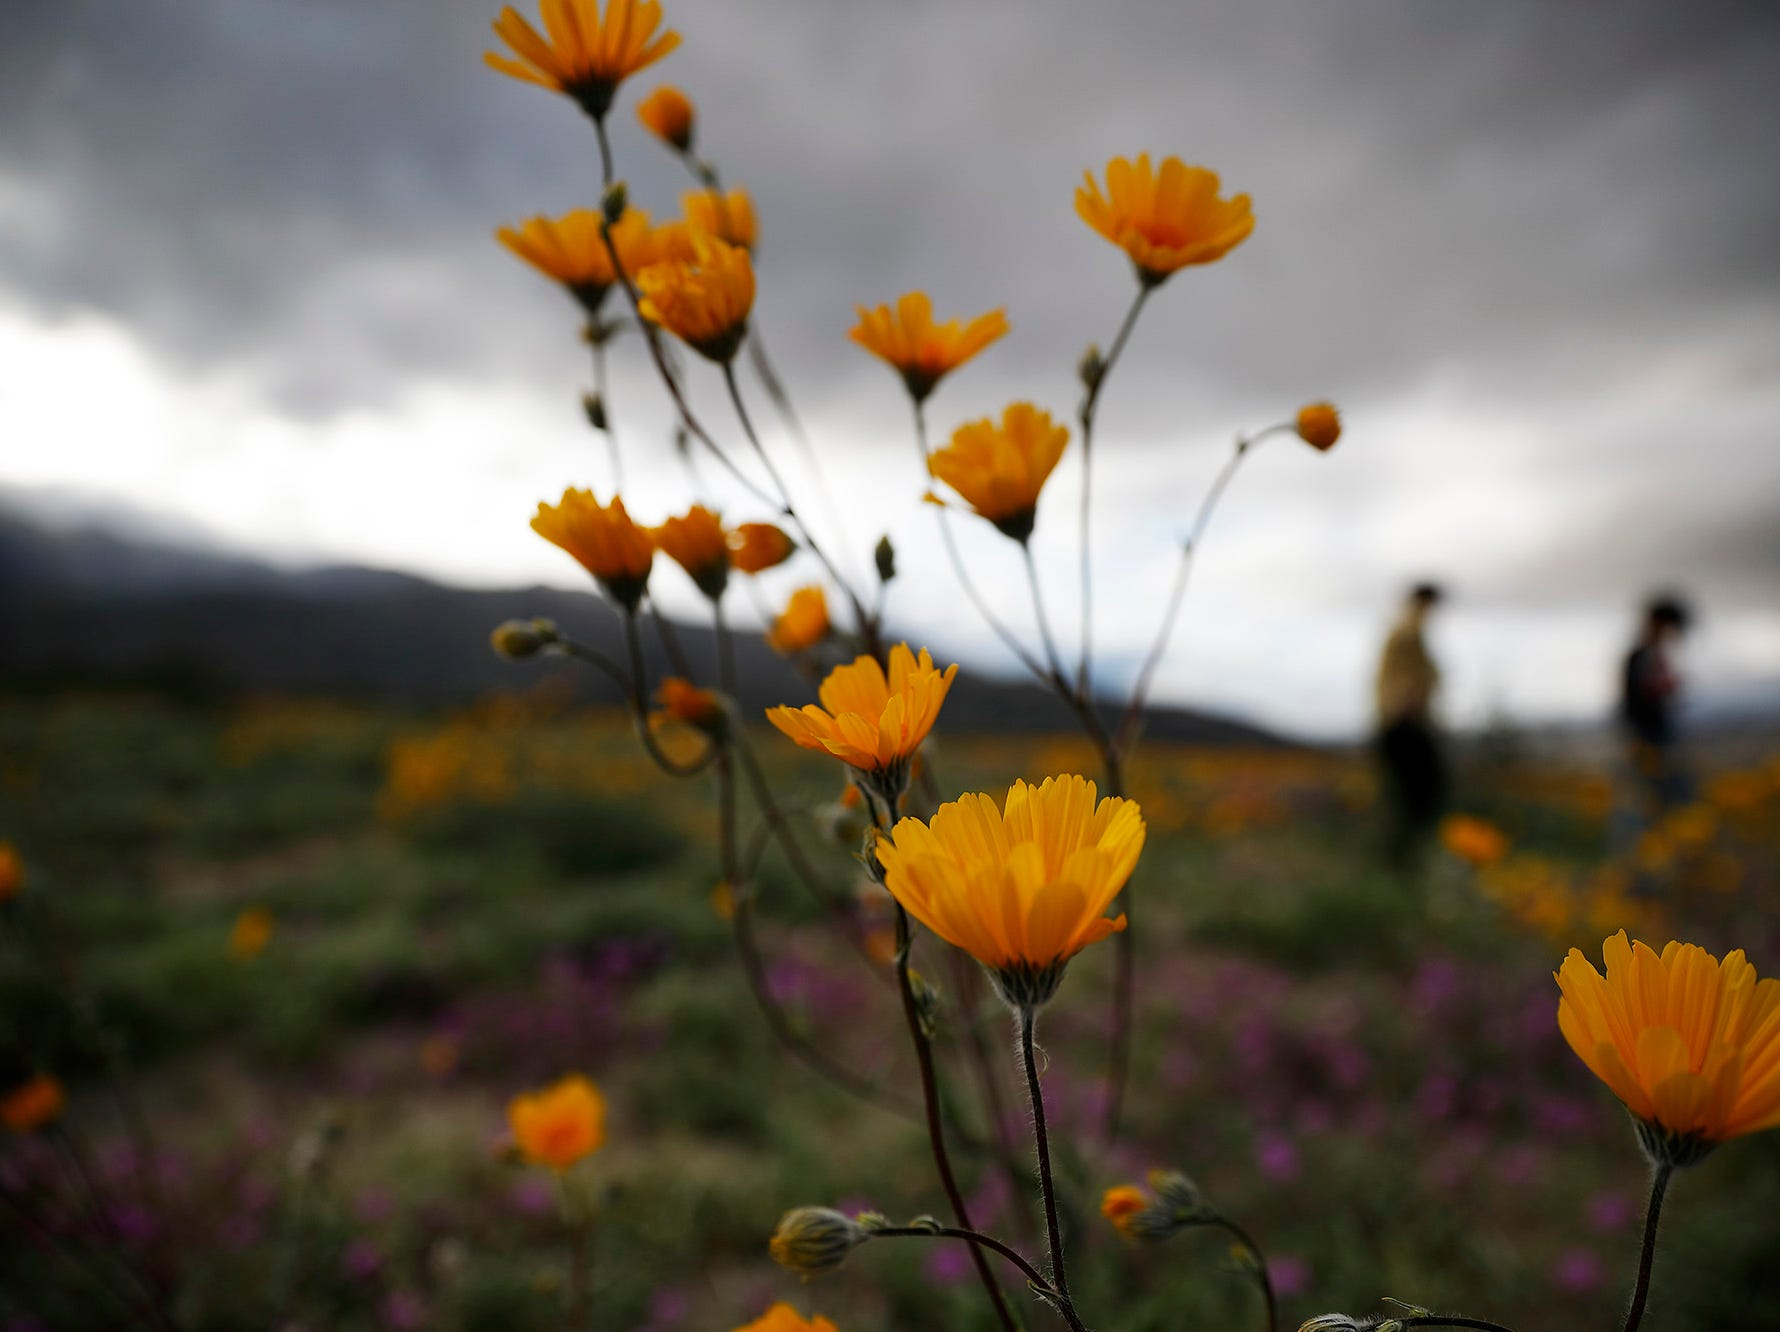 People walk among wildflowers in bloom near Borrego Springs, Calif. March 6, 2019.